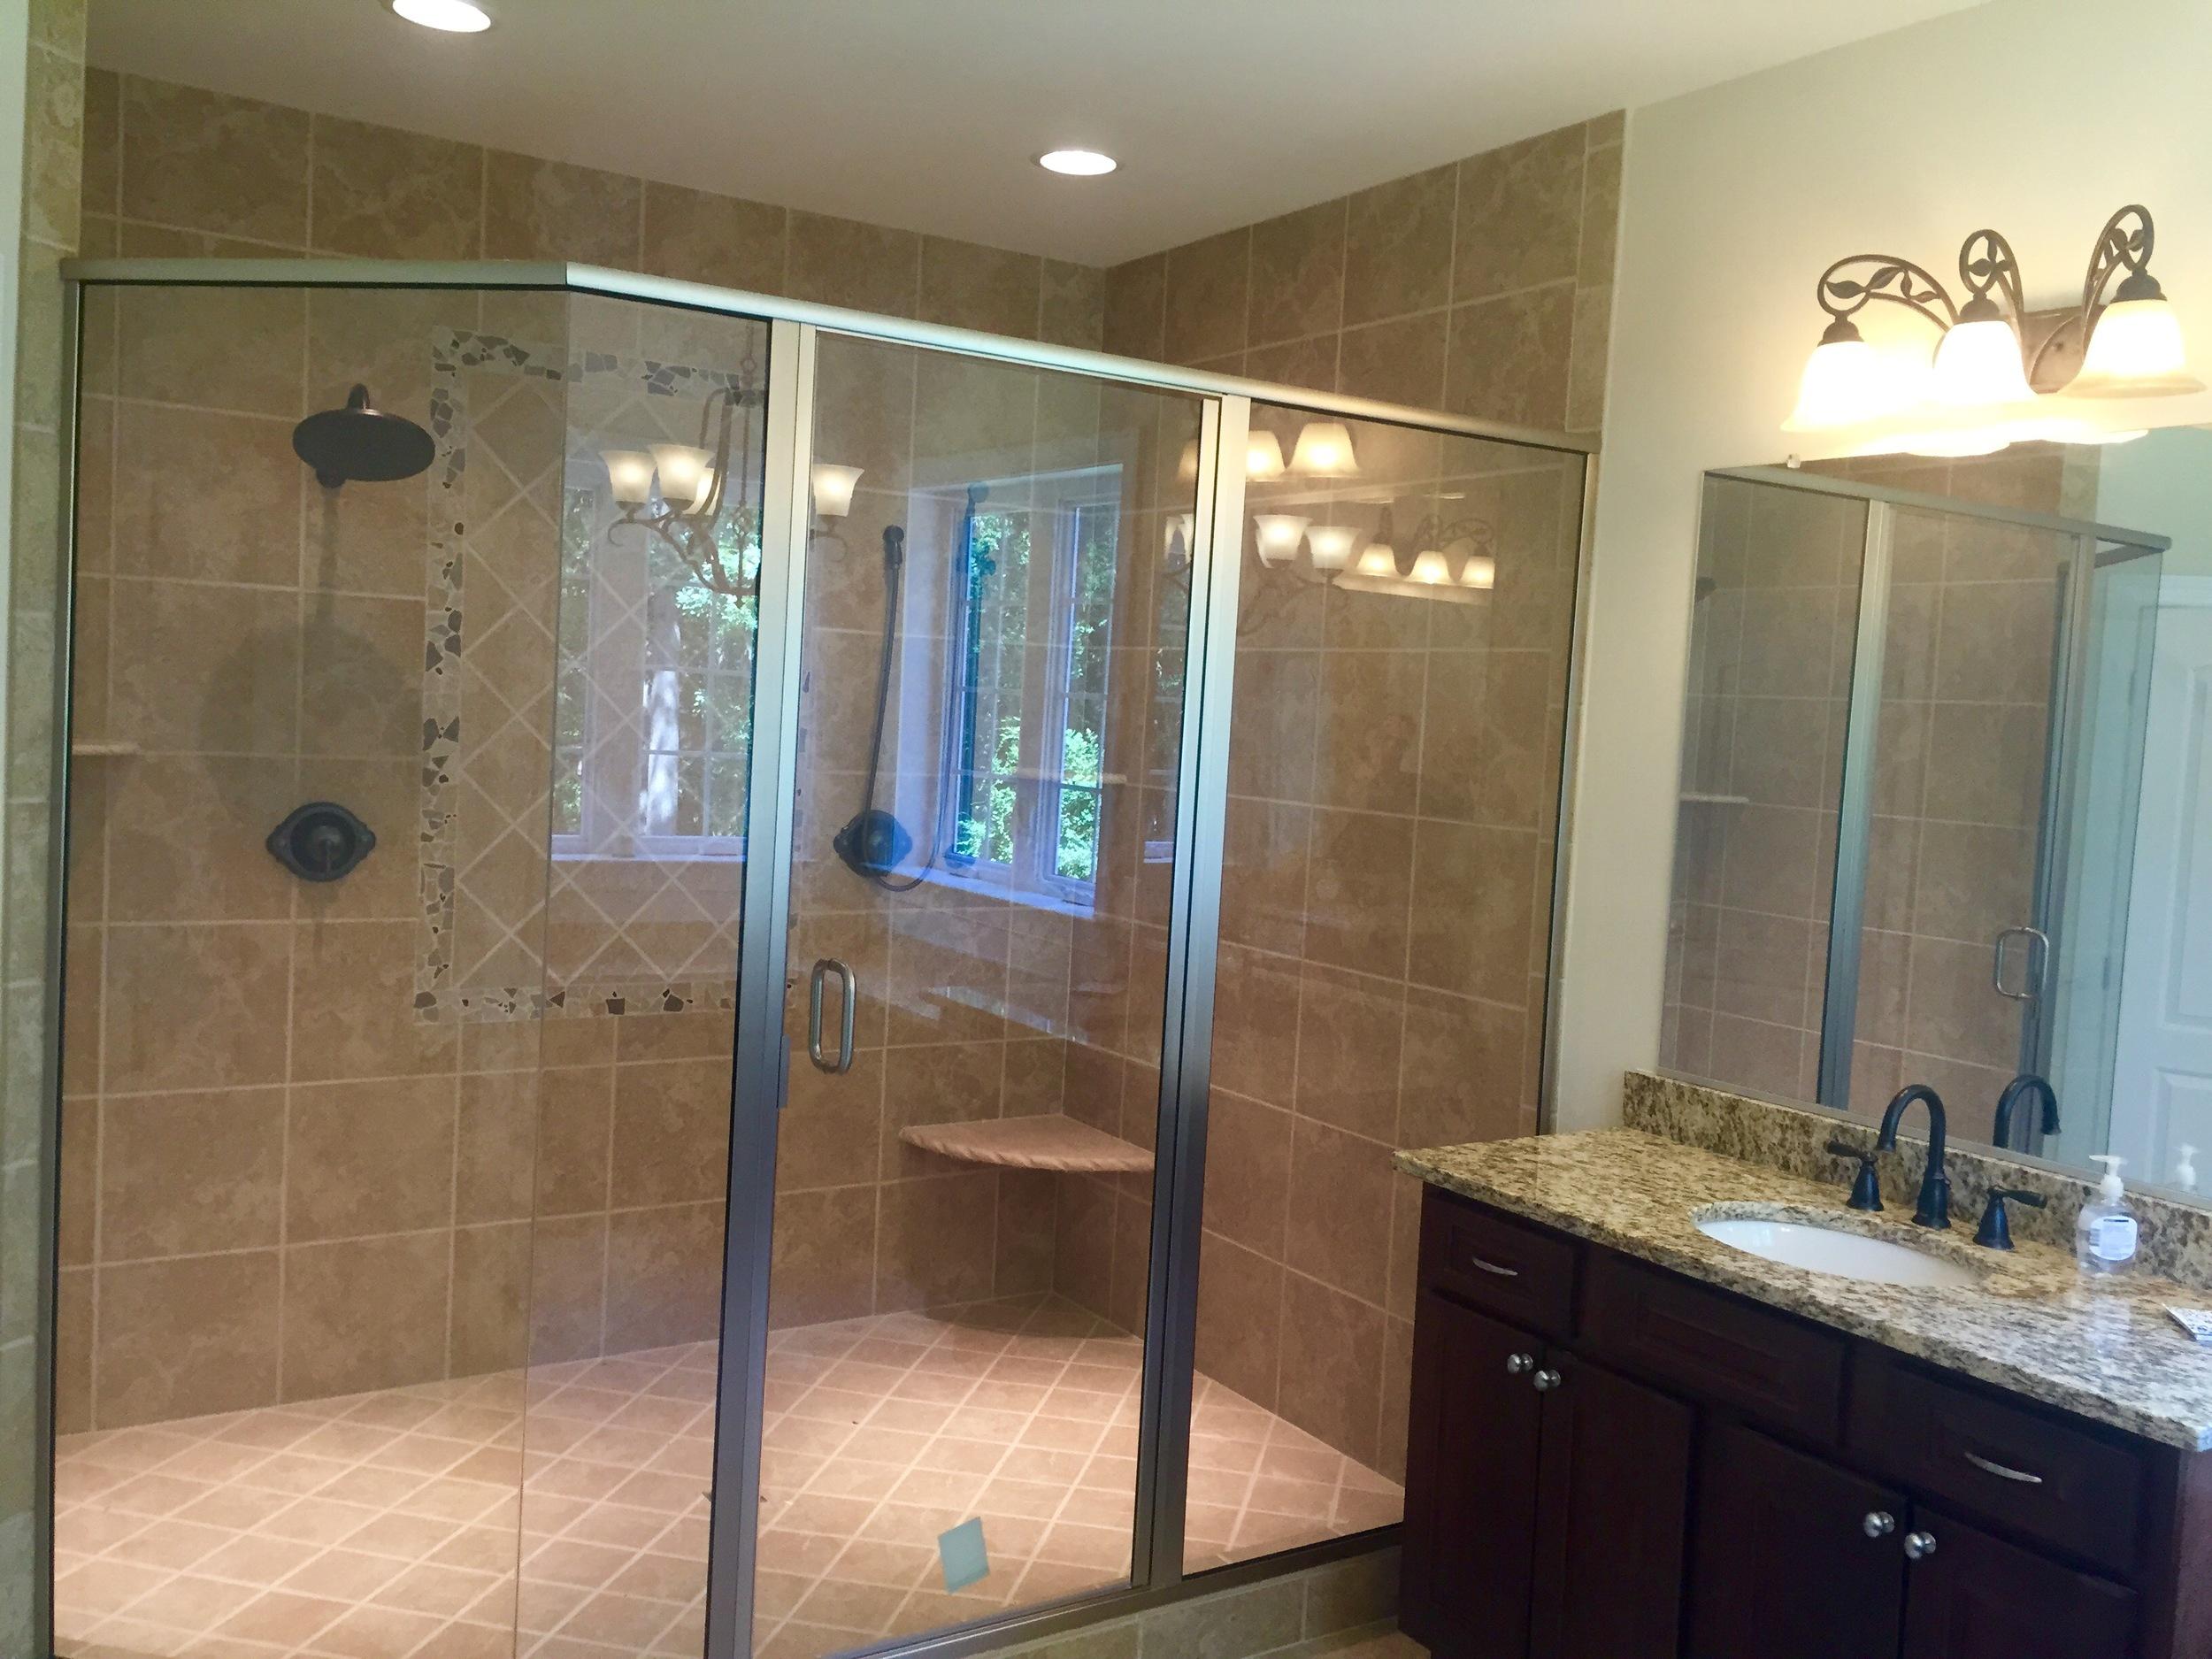 serenitybathroom.jpg